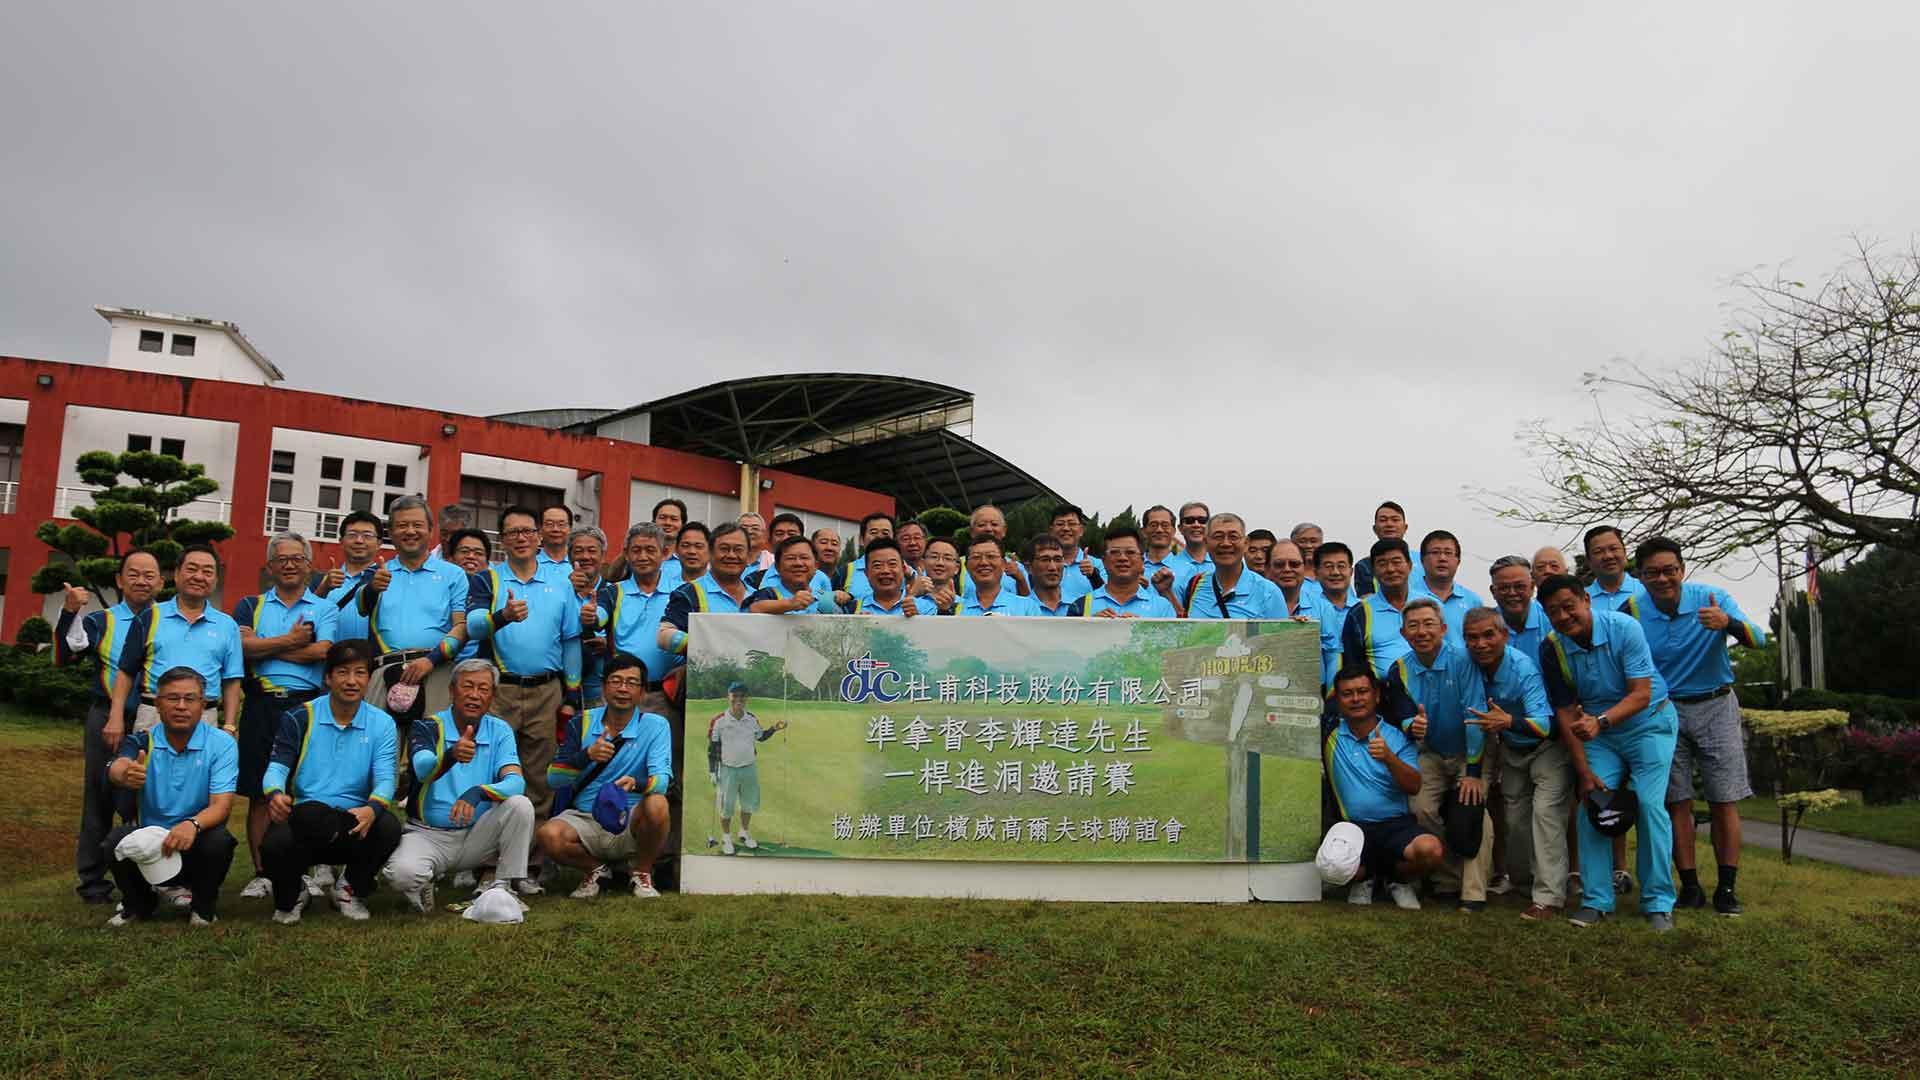 Dufu Technology Lee Hui Ta Hole in One Cup